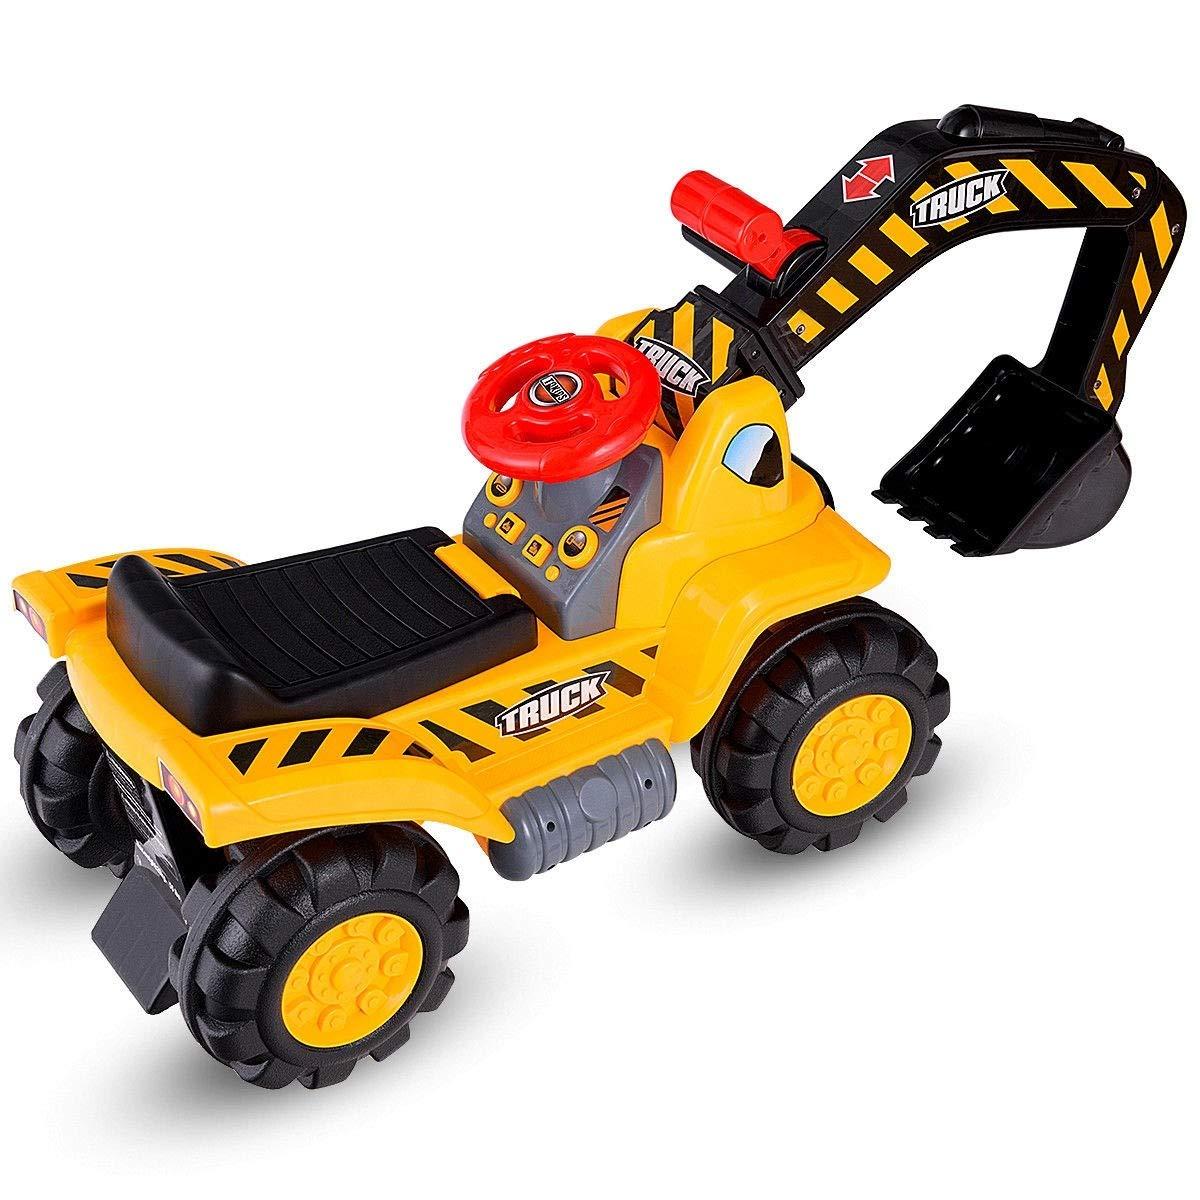 af13bcbcf21de Amazon.com  USA BEST SELLER Kids Toddler Ride On Excavator Digger Truck  Scooter Push Toy Vehicle  Toys   Games